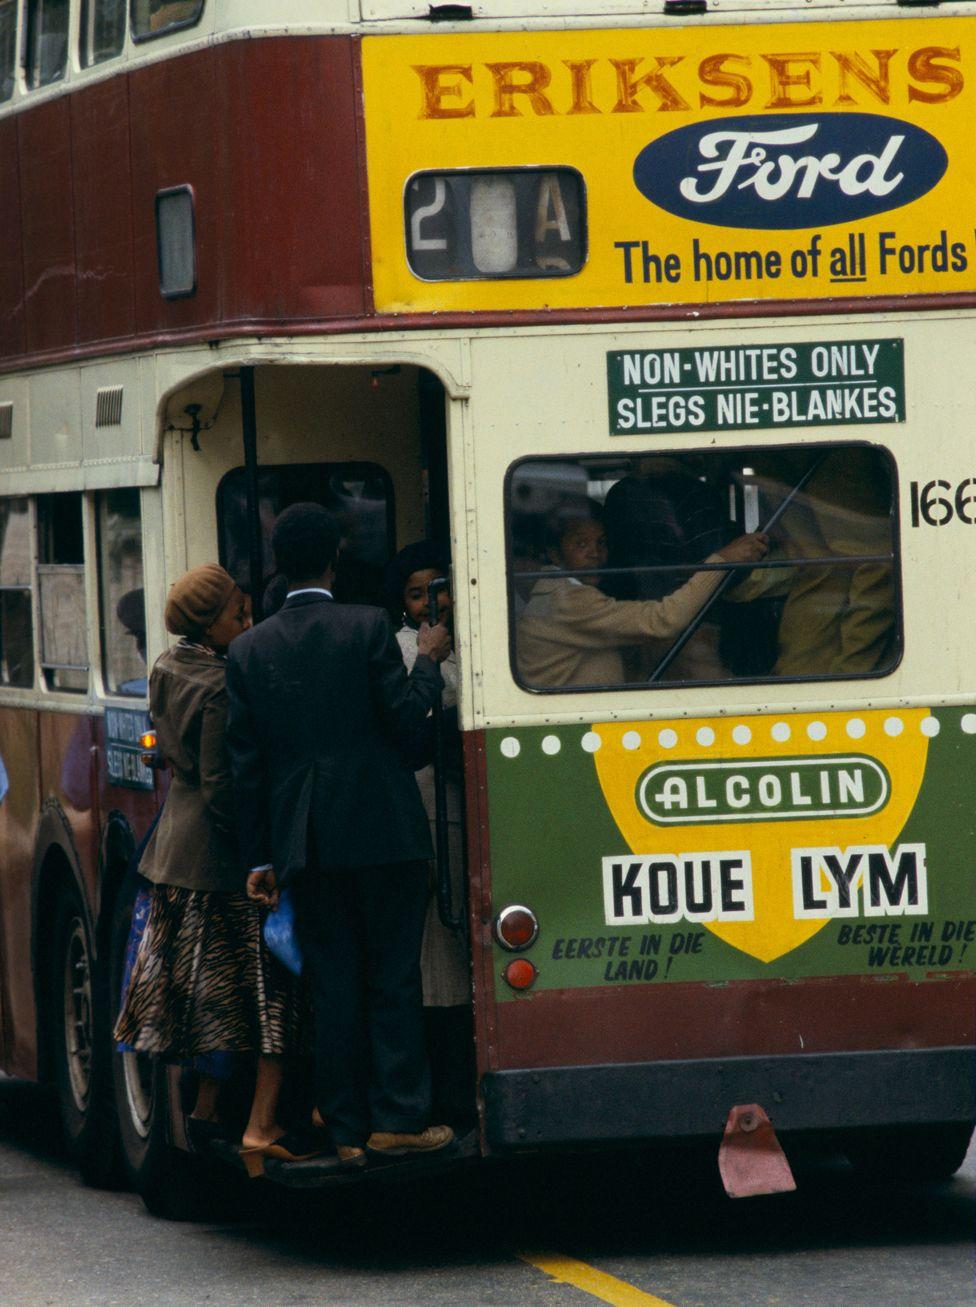 Transport was segregated